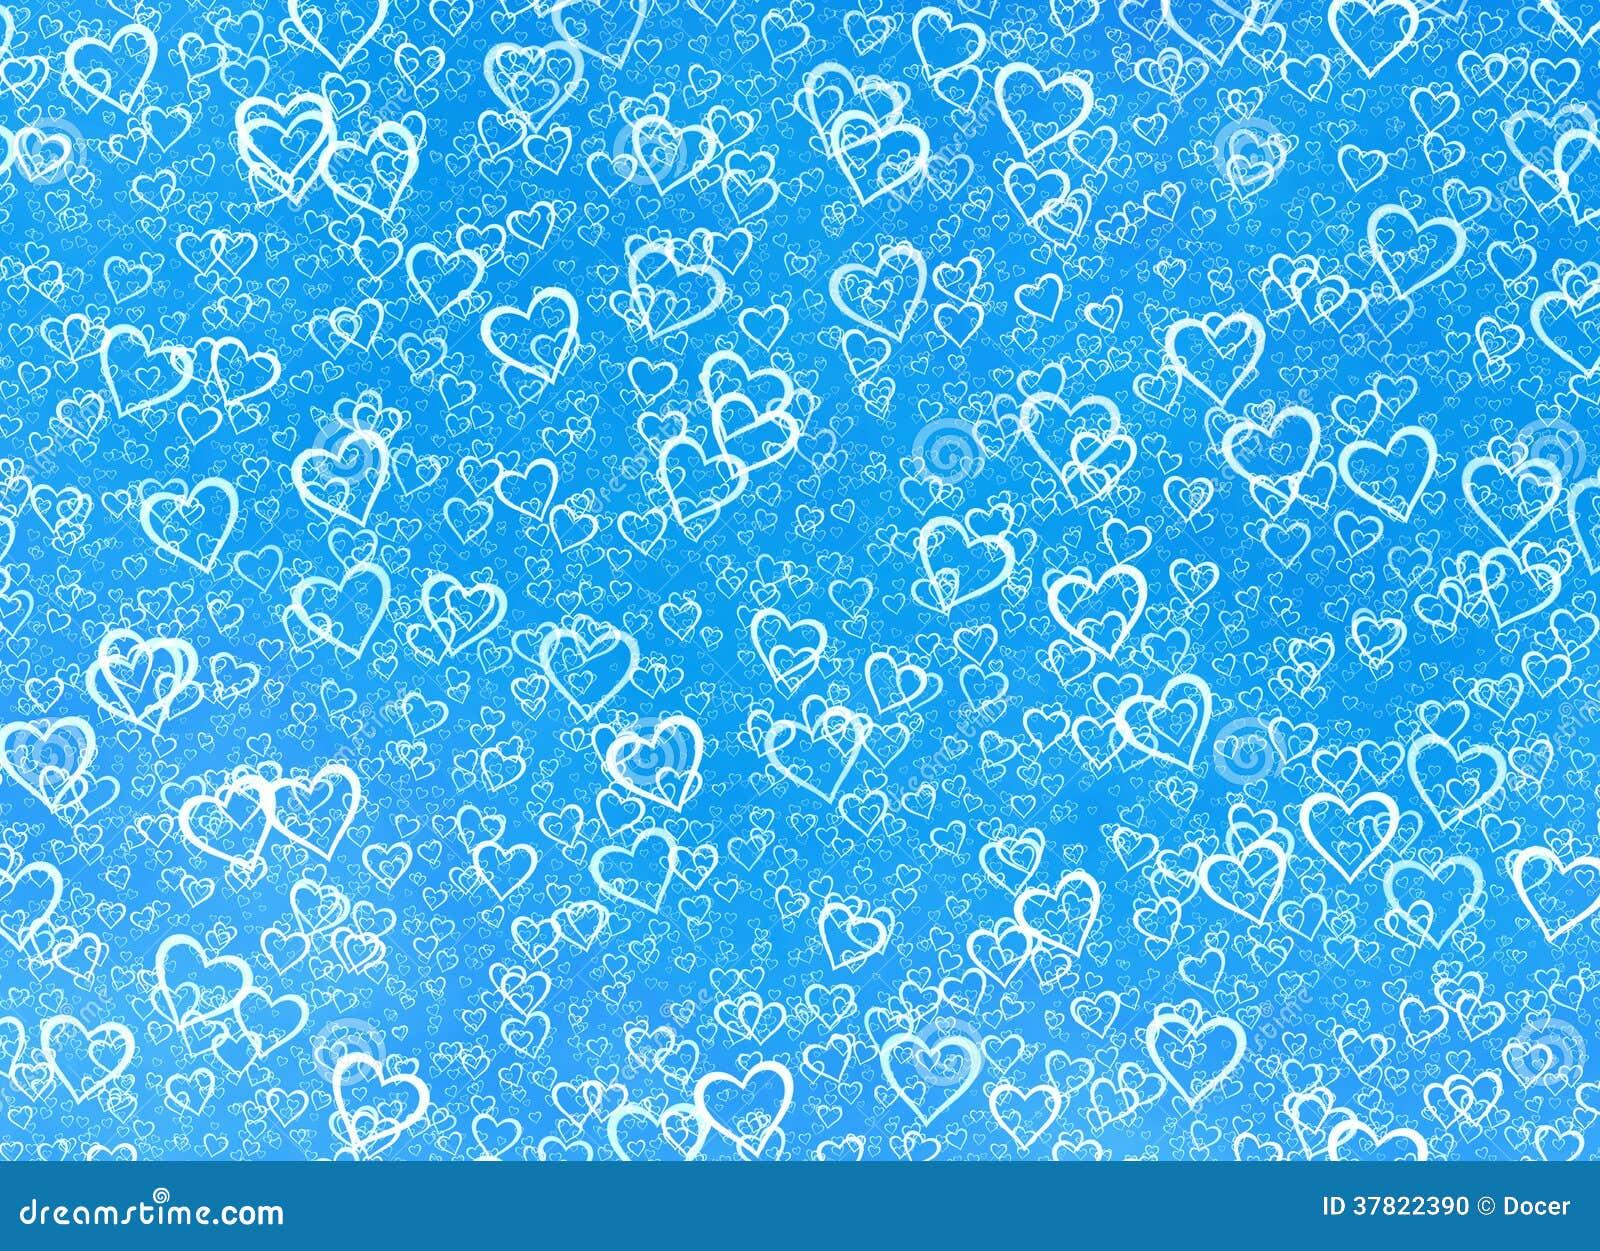 light blue heart background - photo #30